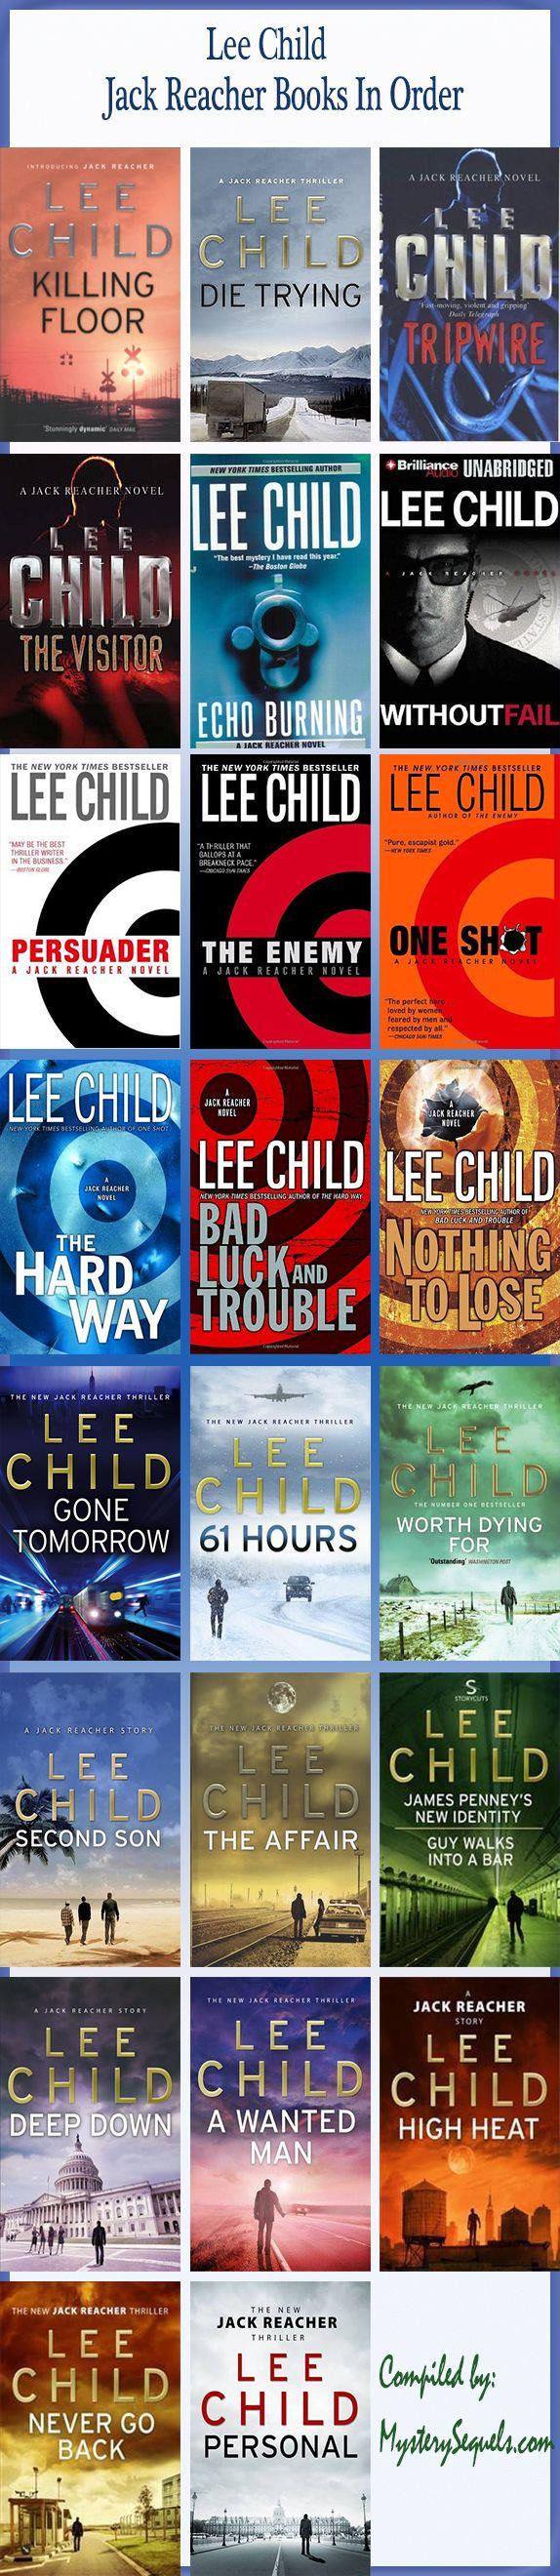 List ofJack Reacher books by Lee Child #mysterybooks